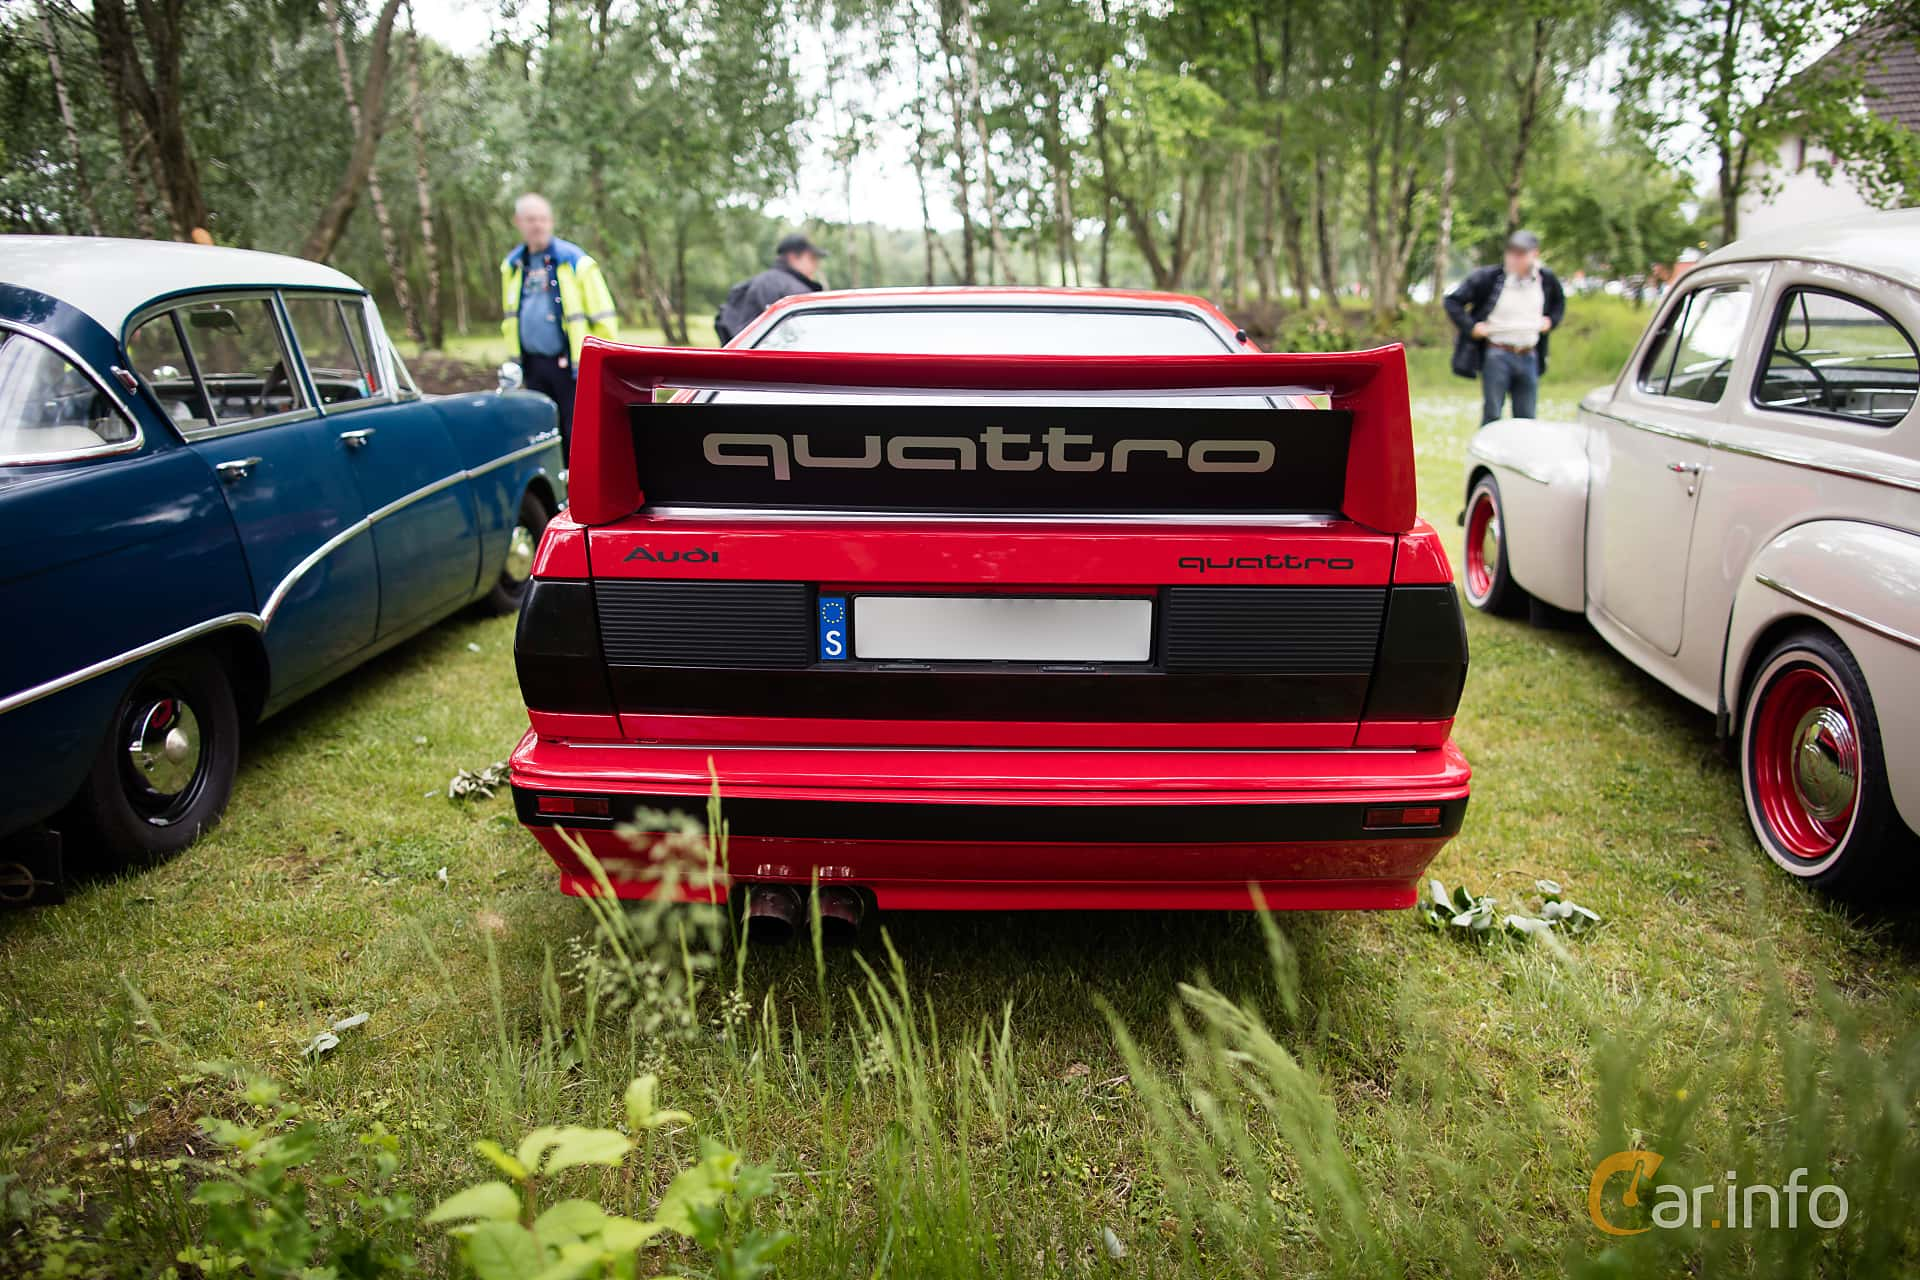 Audi quattro 2.1 quattro Manual, 200hp, 1983 at Eddys bilträff Billesholm Juni 2017